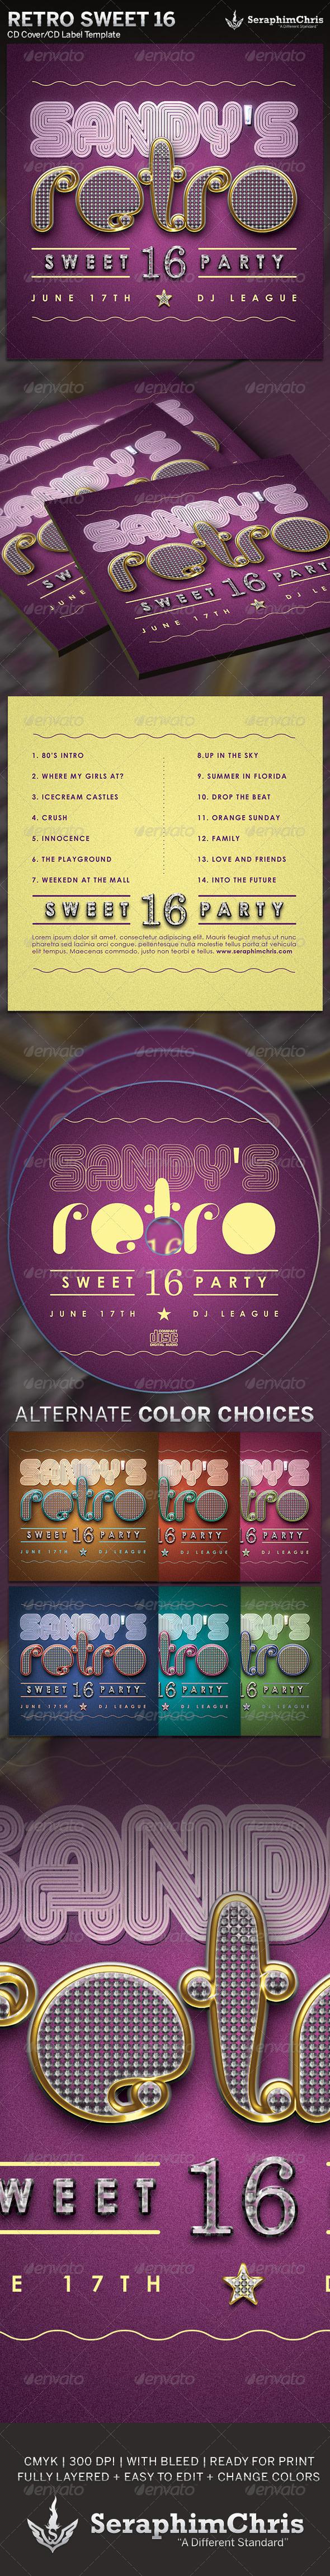 GraphicRiver Retro Sweet 16 CD Cover Artwork Template 5046366